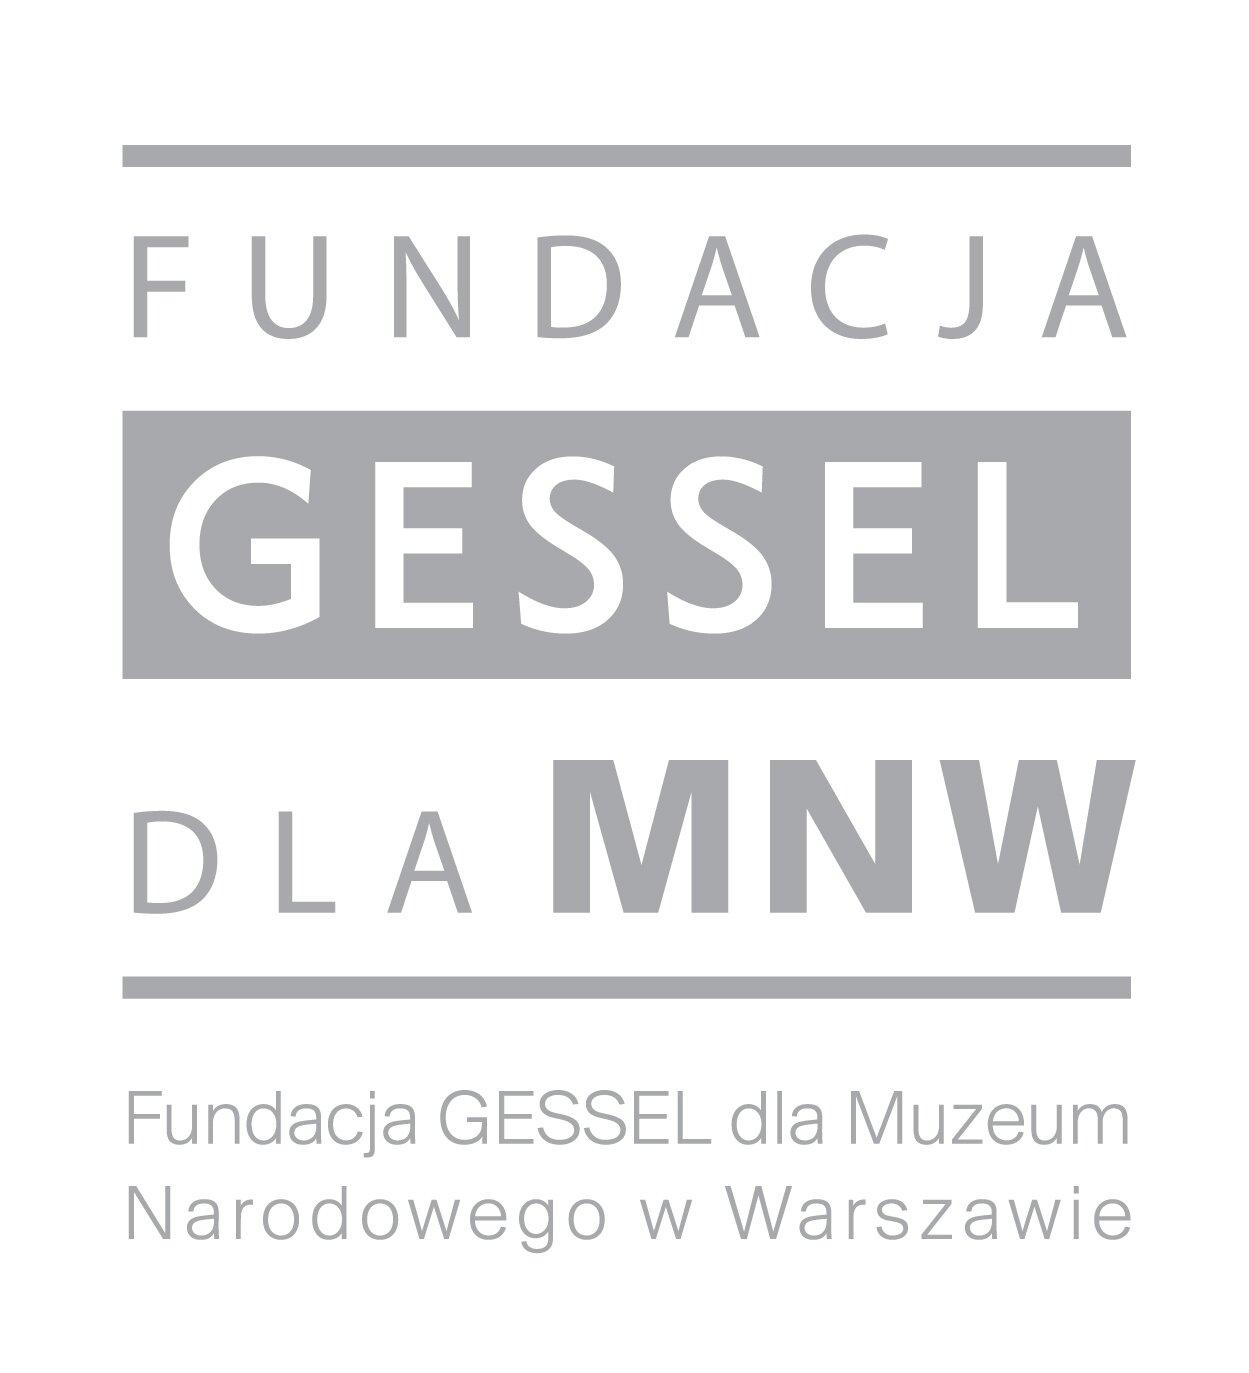 Fundacja GESSEL